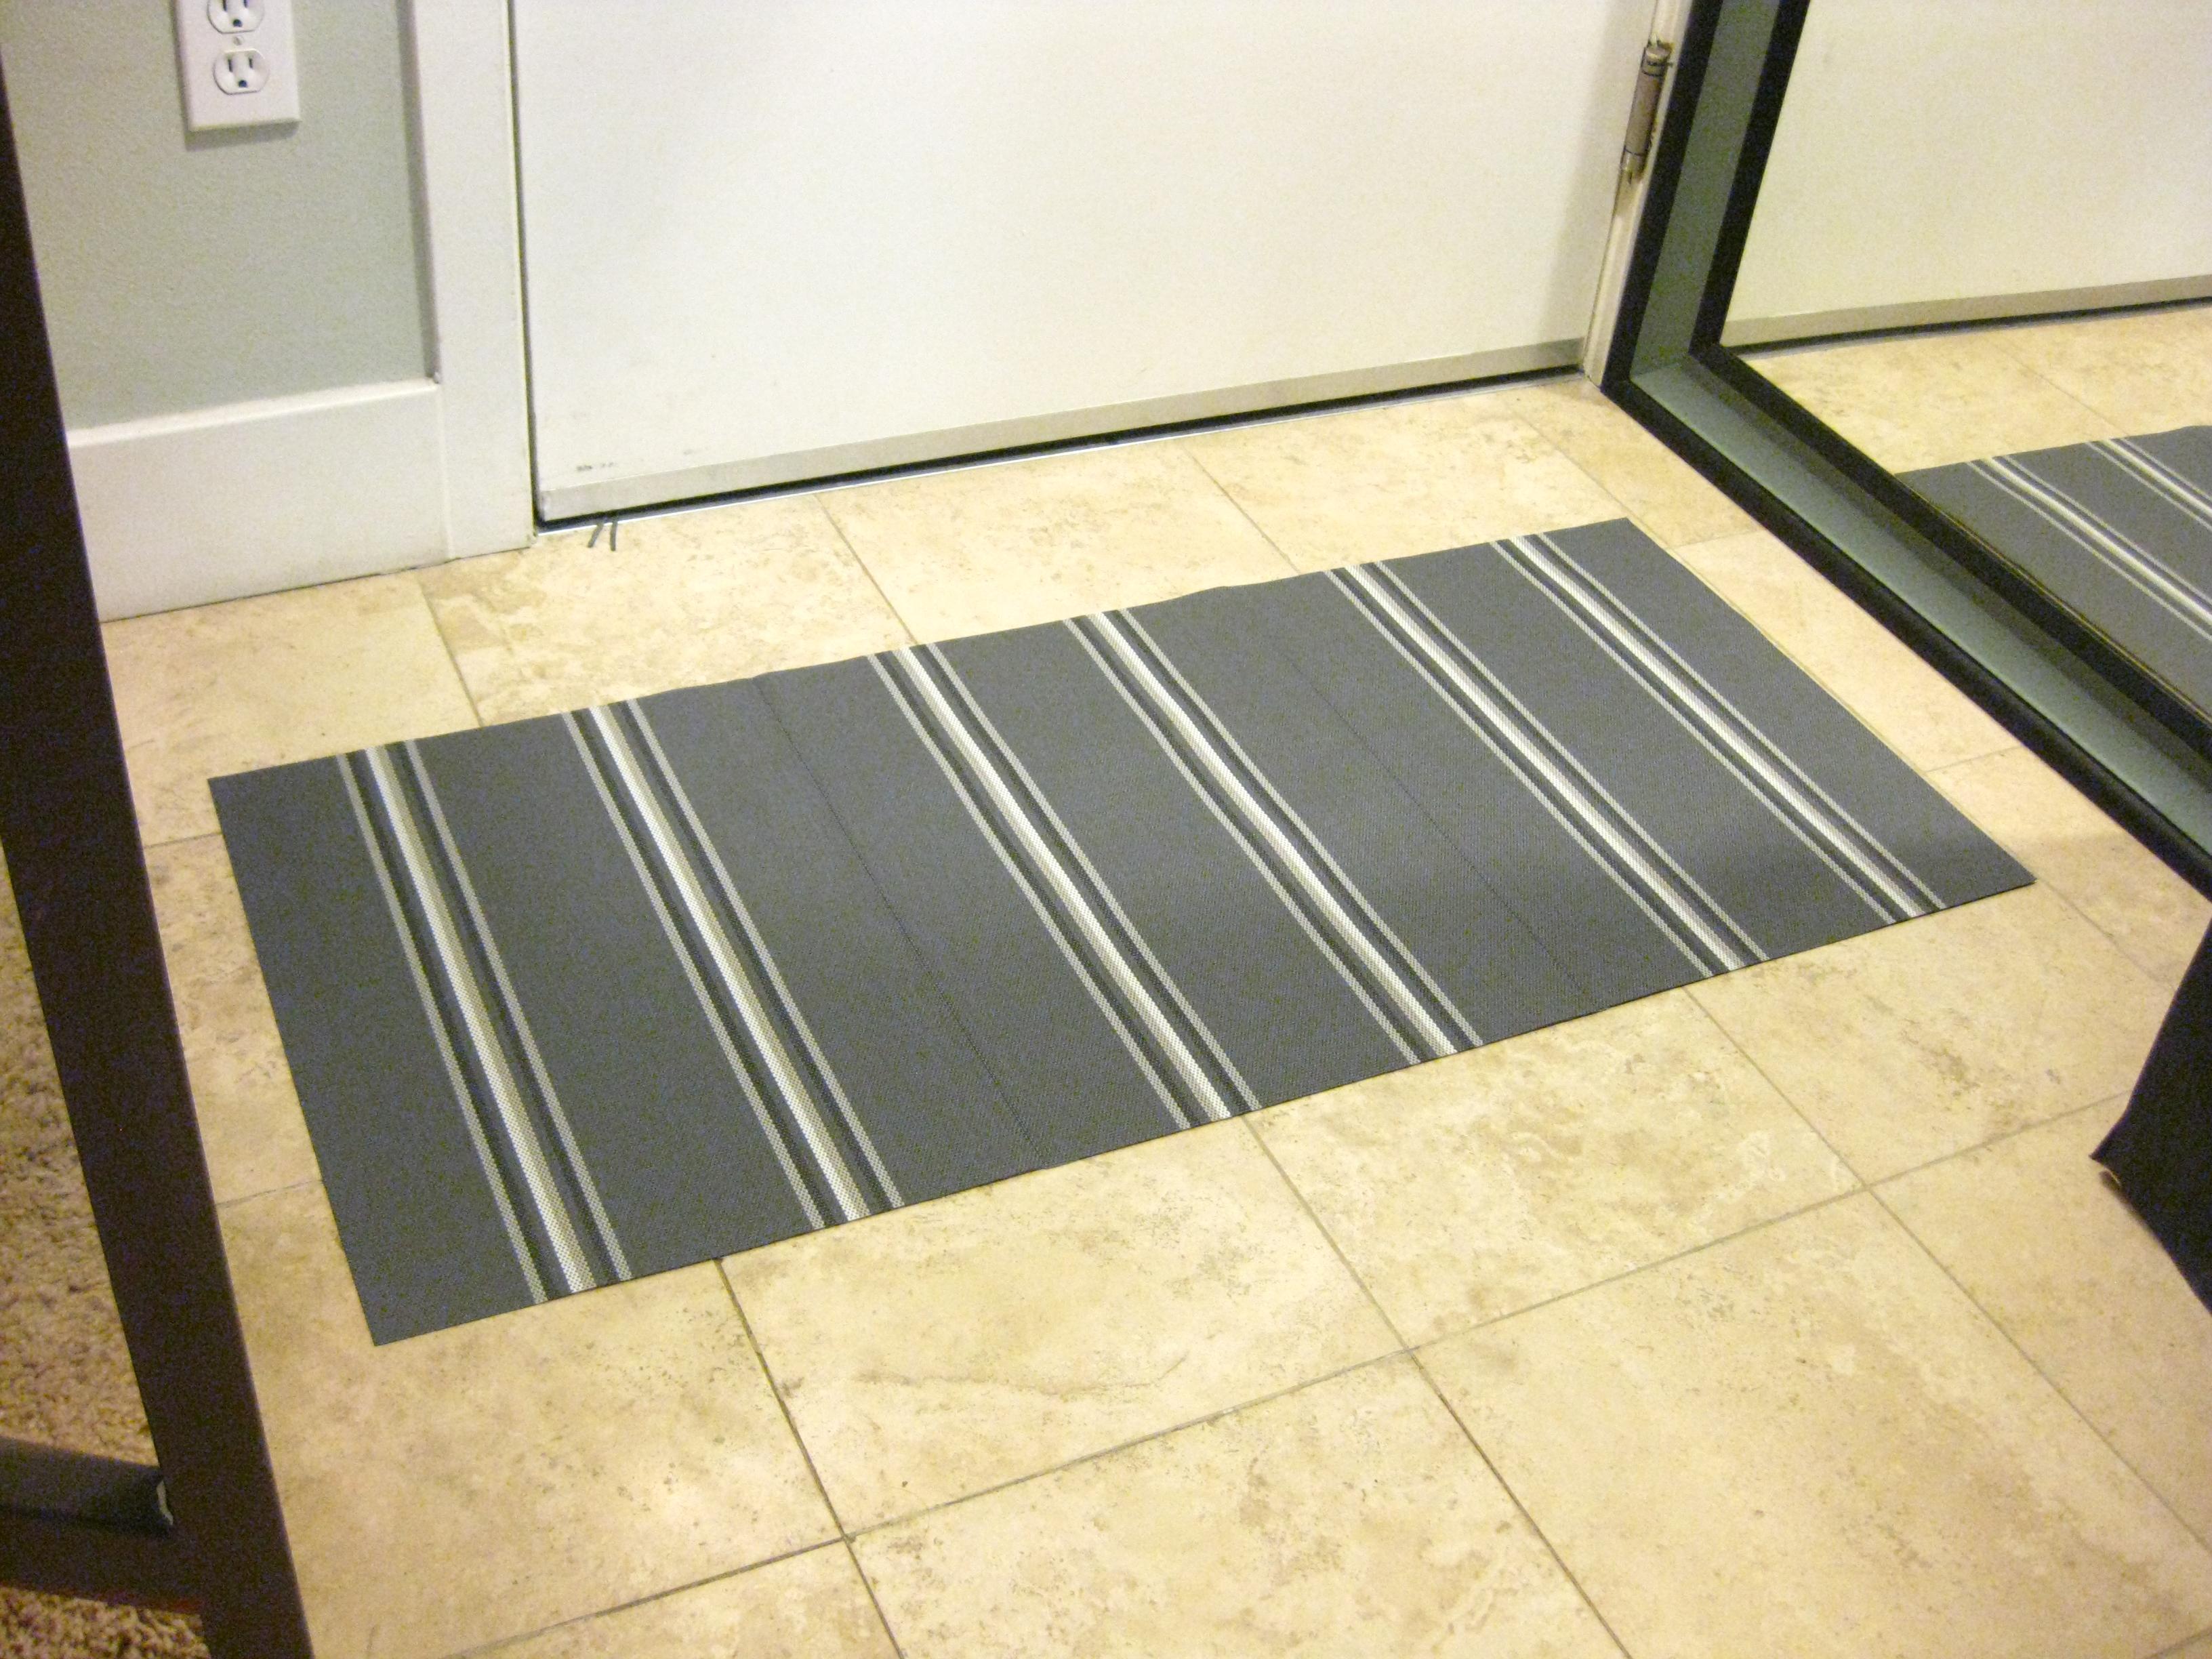 A Little DIY Low Profile Floor Mat Using Placemats FuzzyCloudDesigns Blog